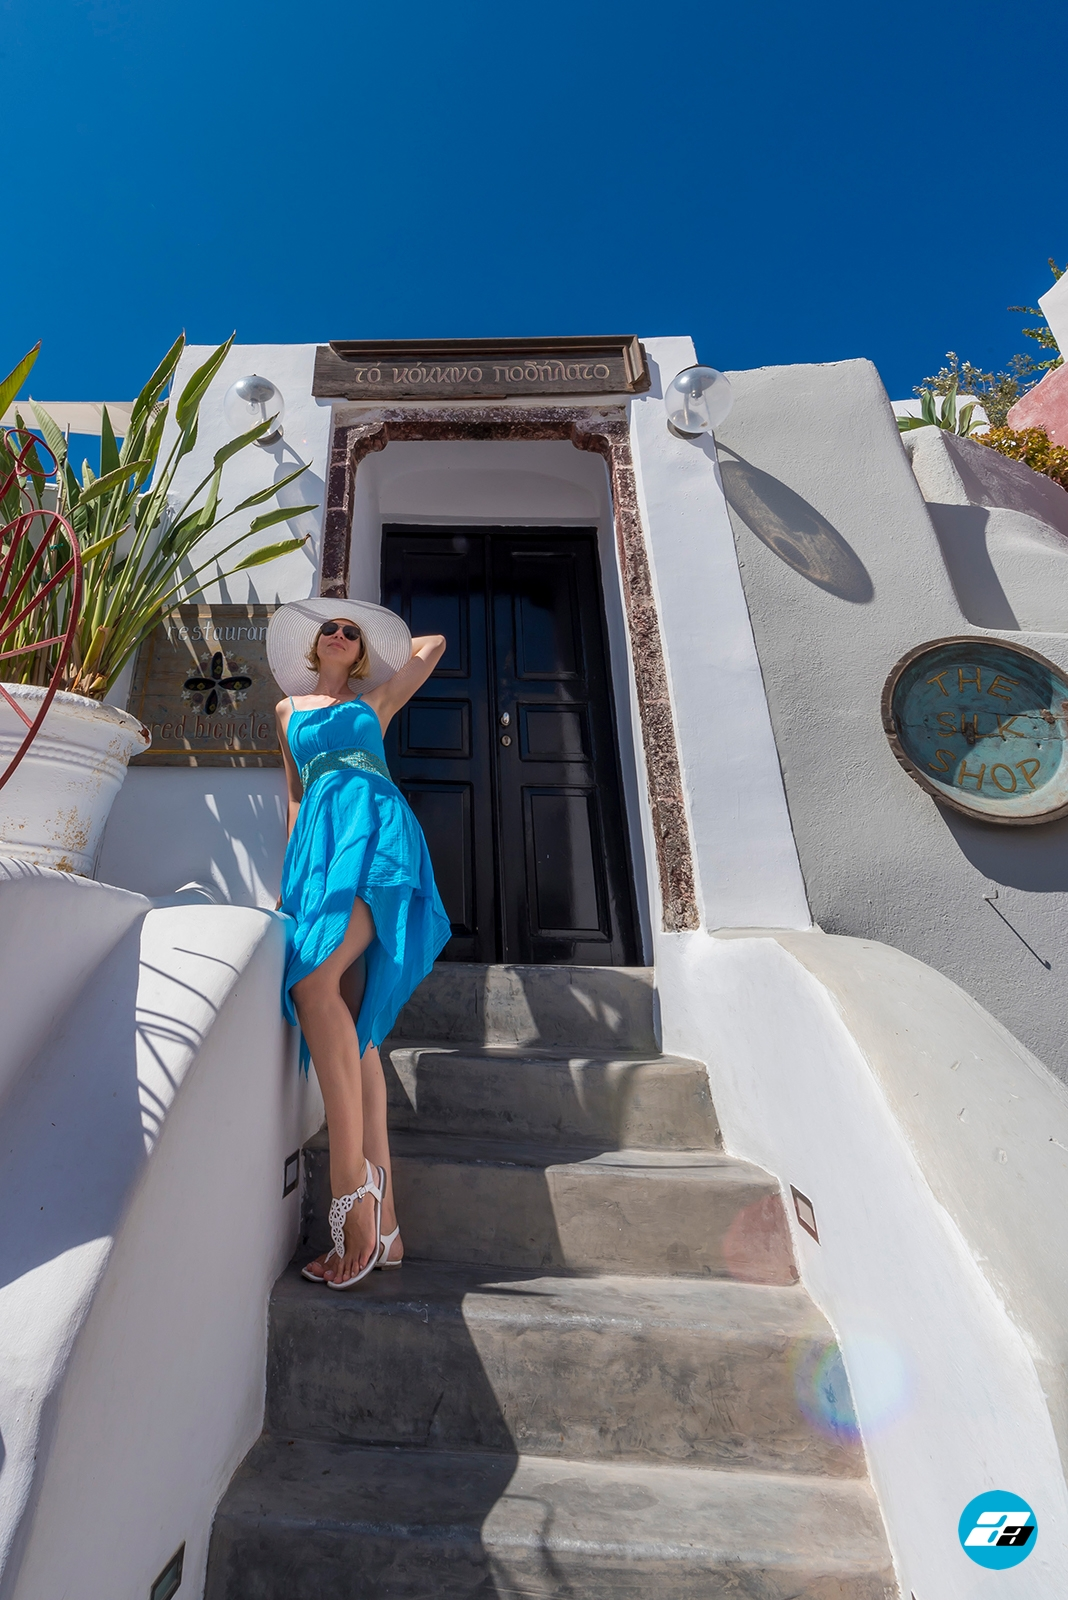 Oia, Santorini, Greece. Santorini Travel. Fashion Model. Blue Dress. White Hat.